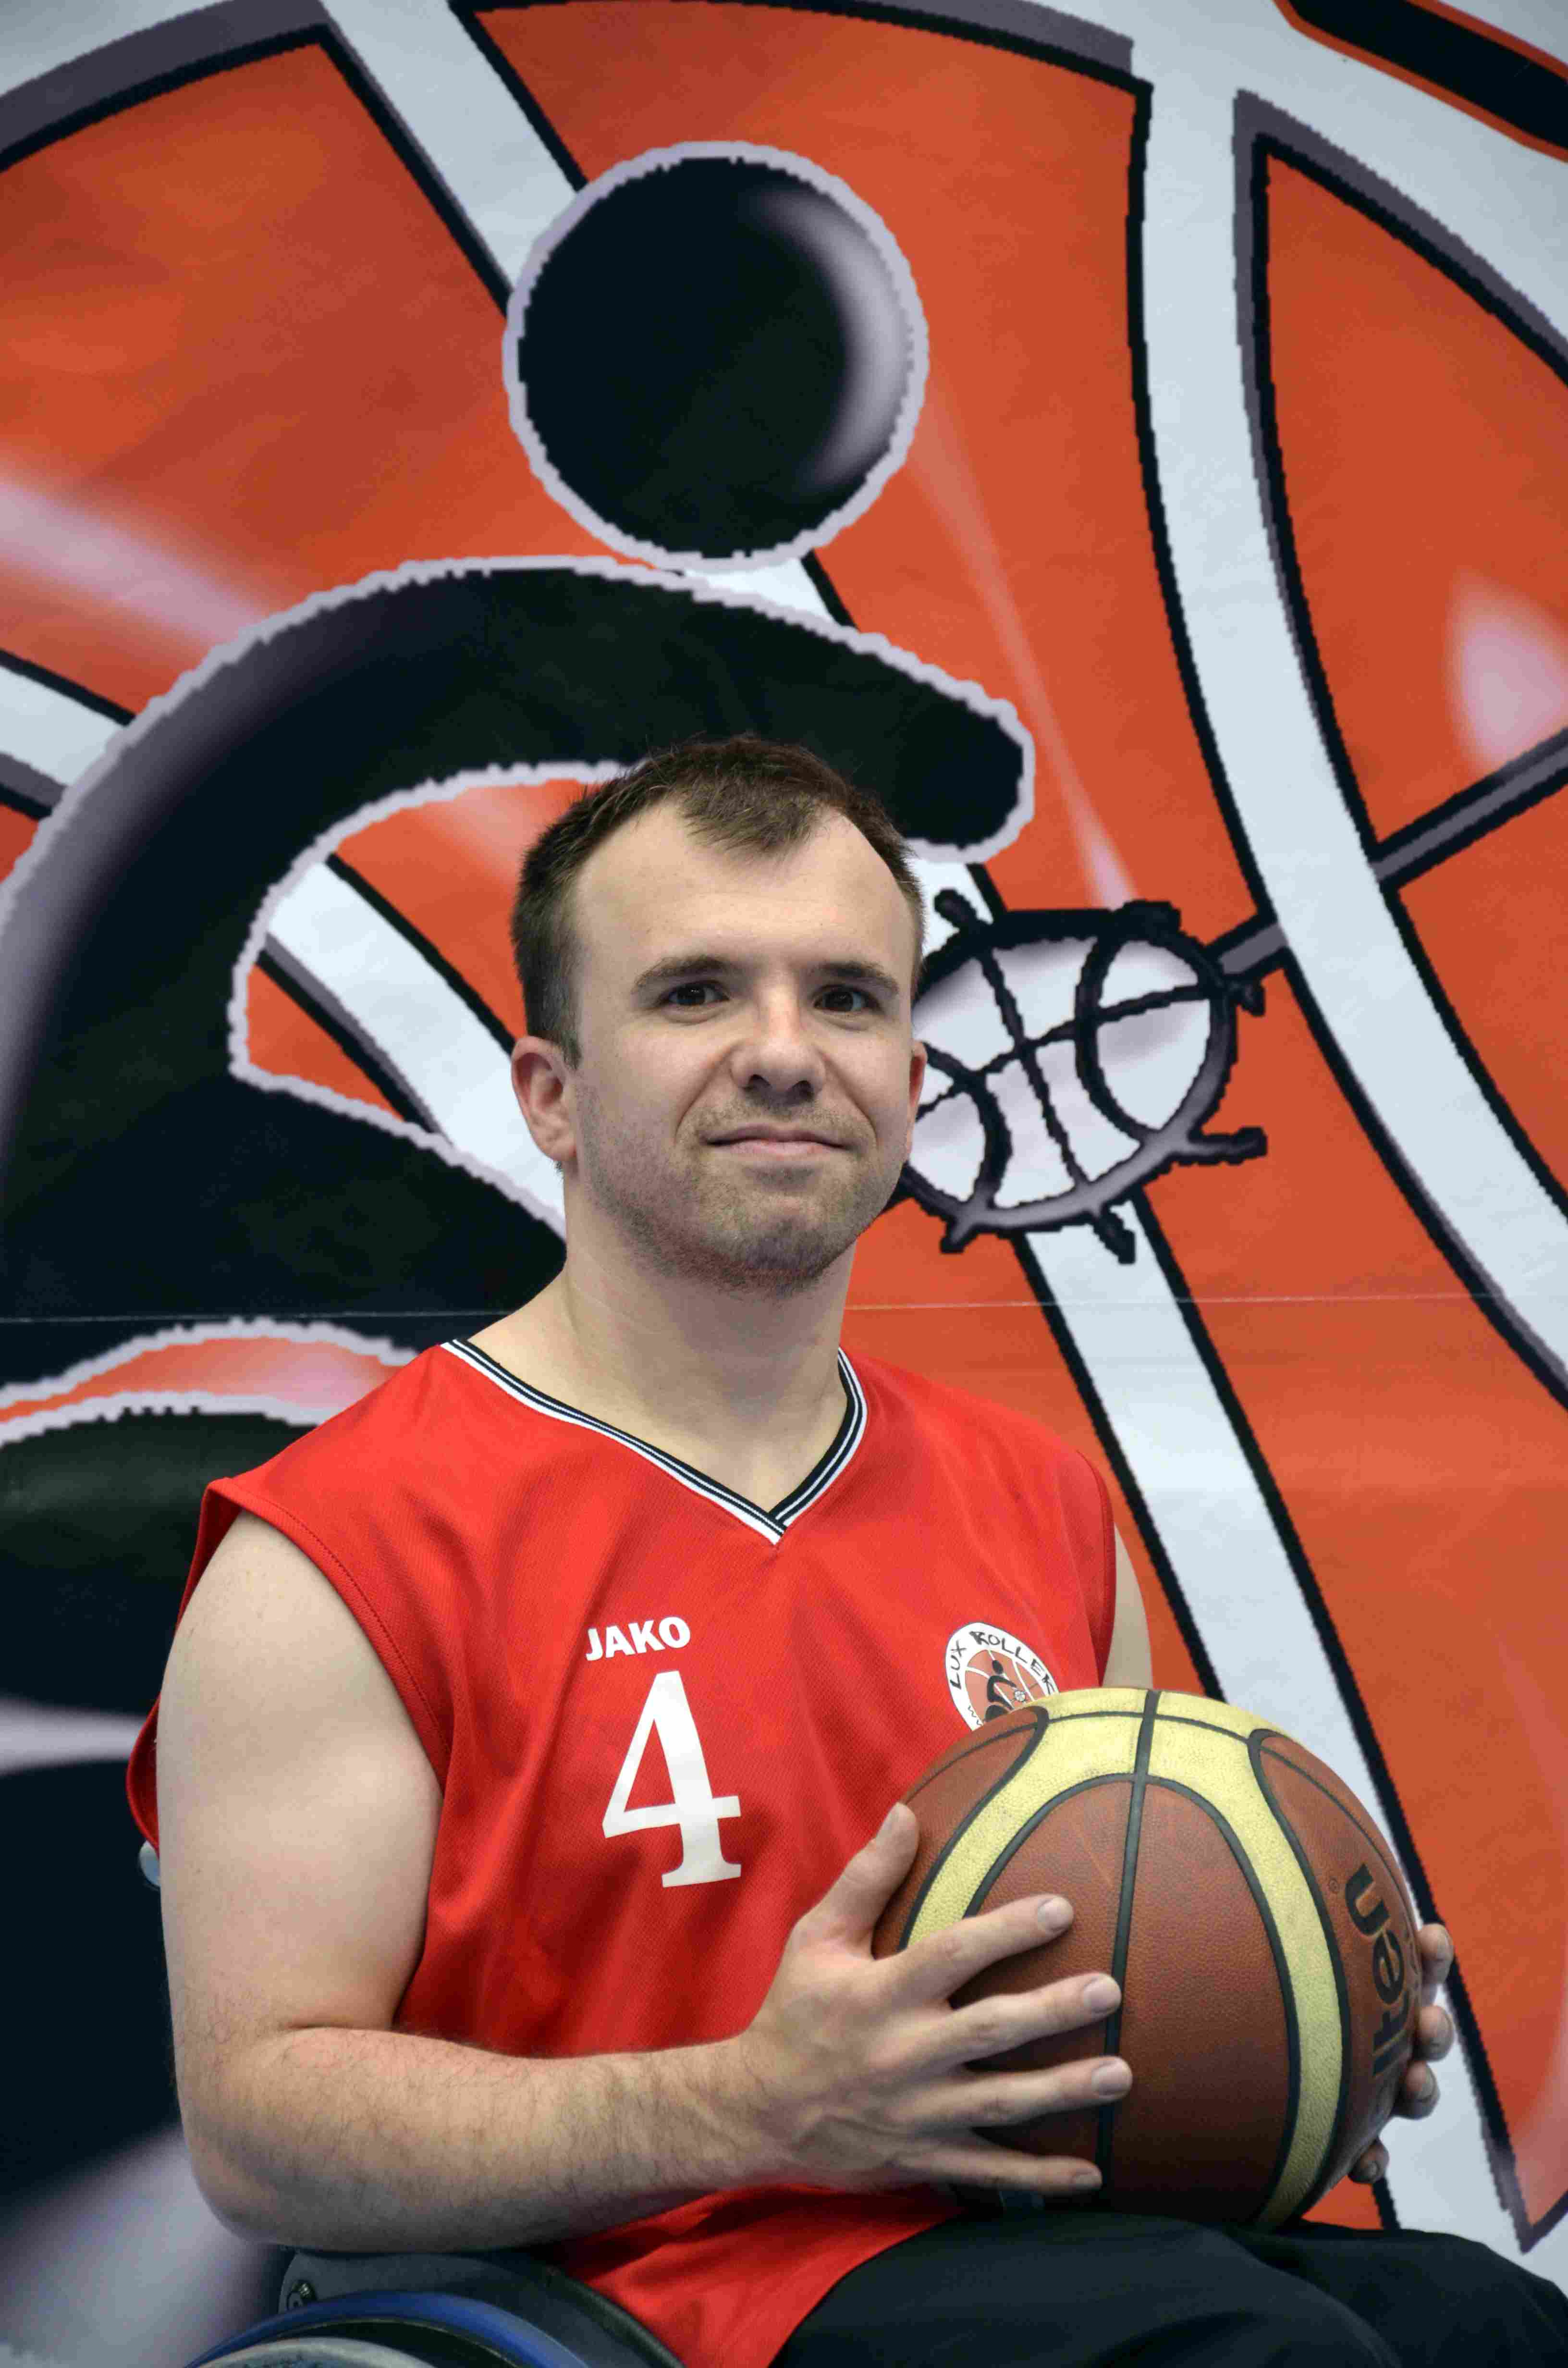 Sébastien ISIDORI